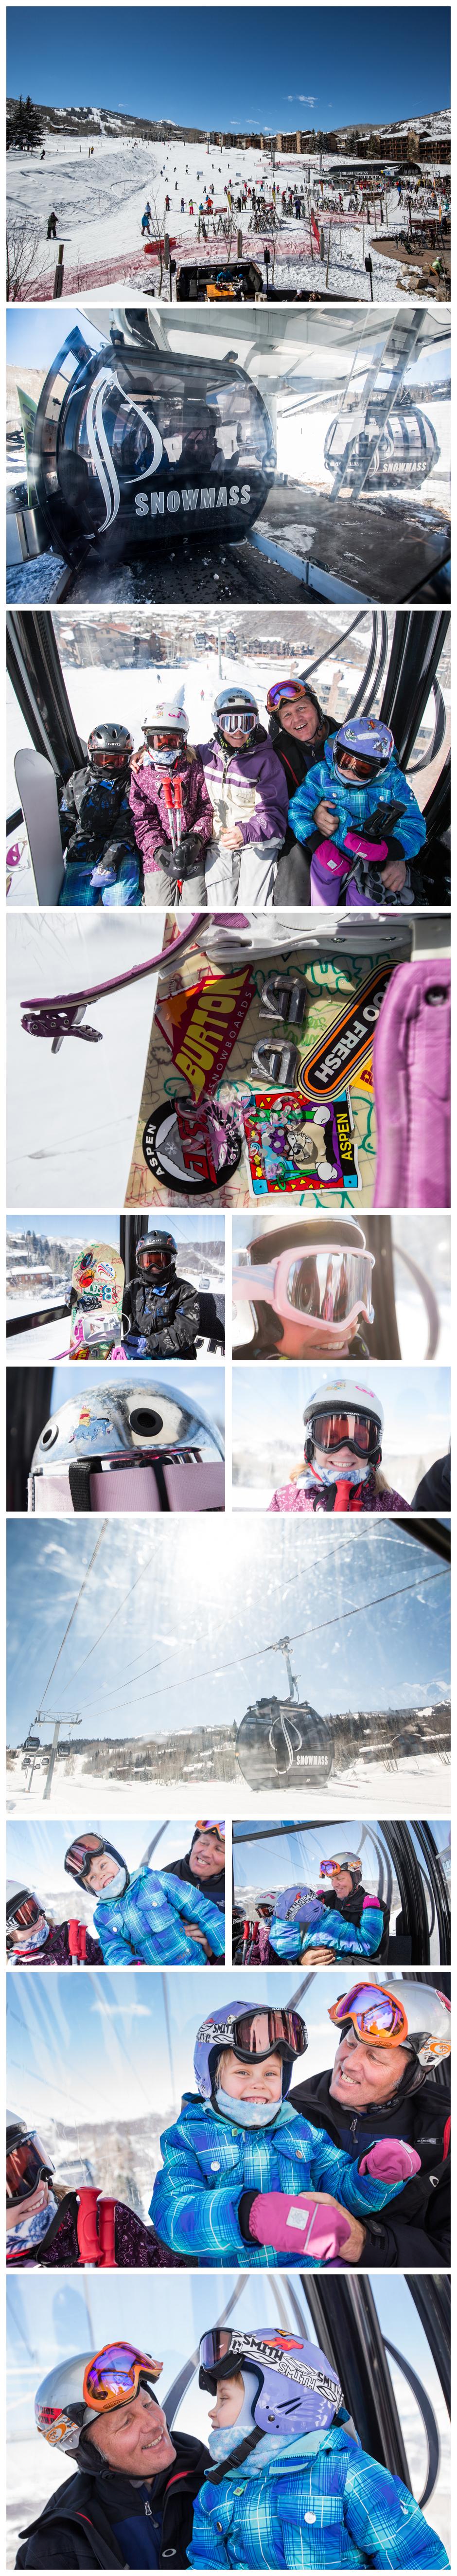 Blog Collage-1363888894950